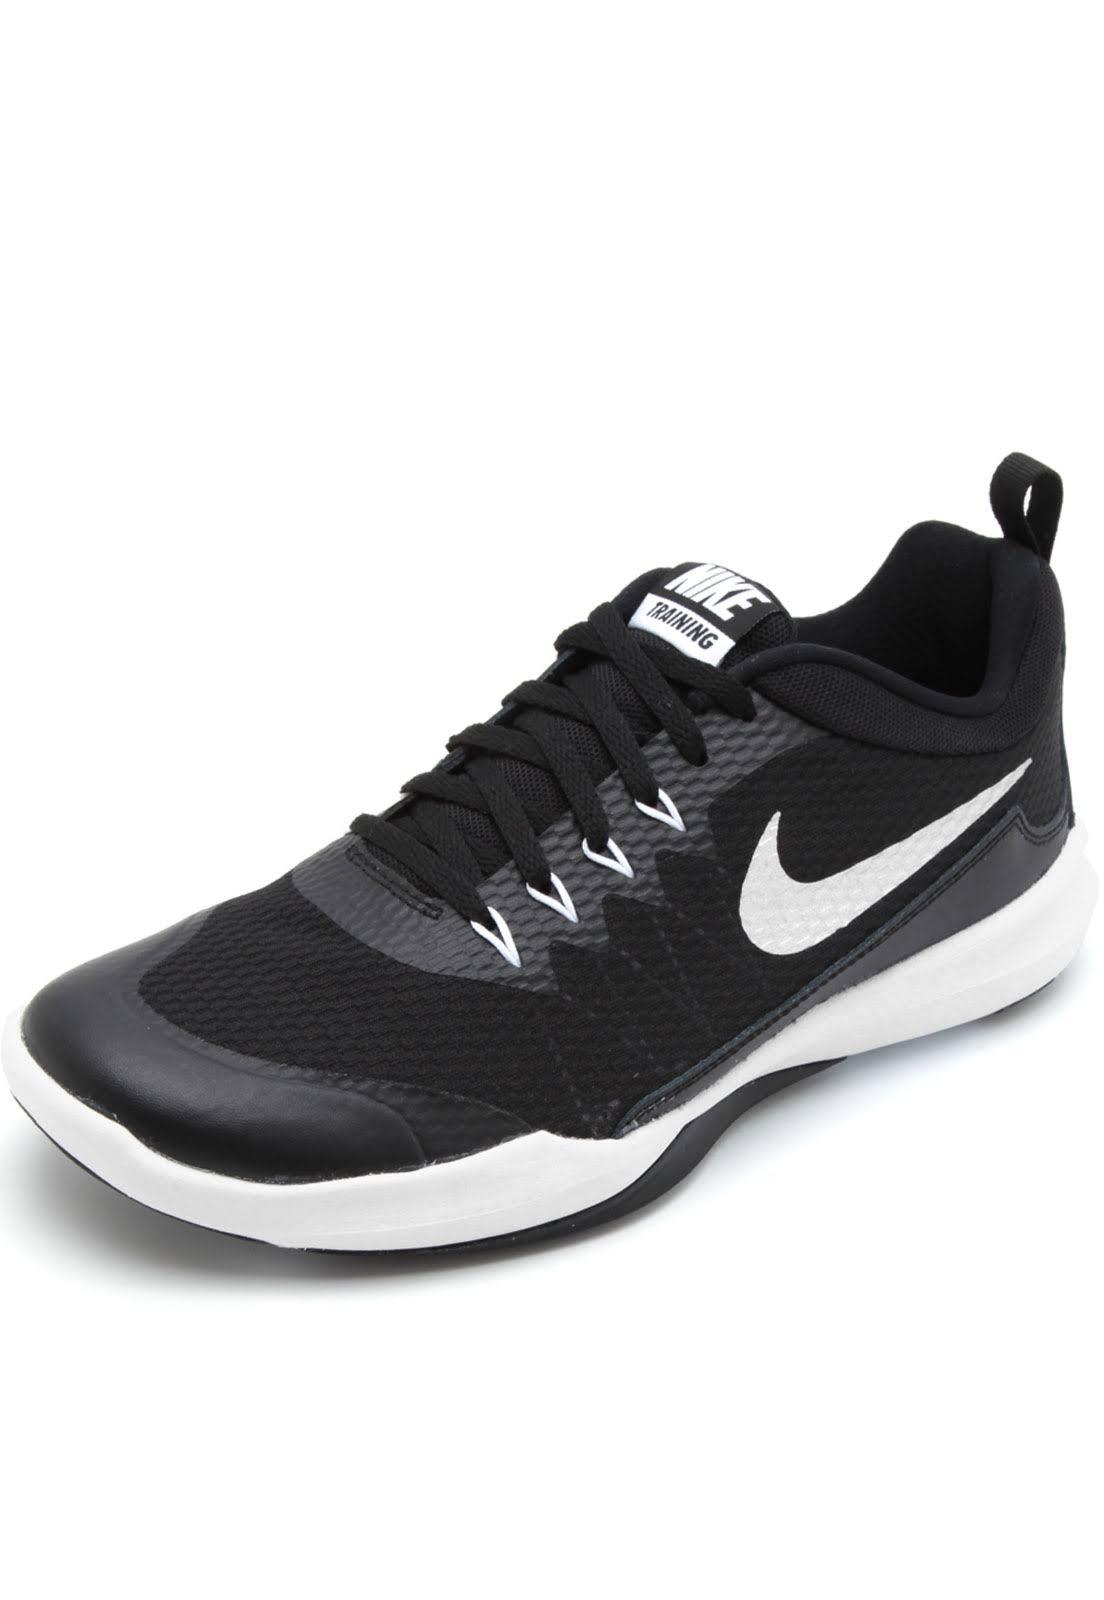 Nike Legend Nike ZwartZilver ZwartZilver Legend TrainerHeren TrainerHeren Legend Nike qULGzMVpS